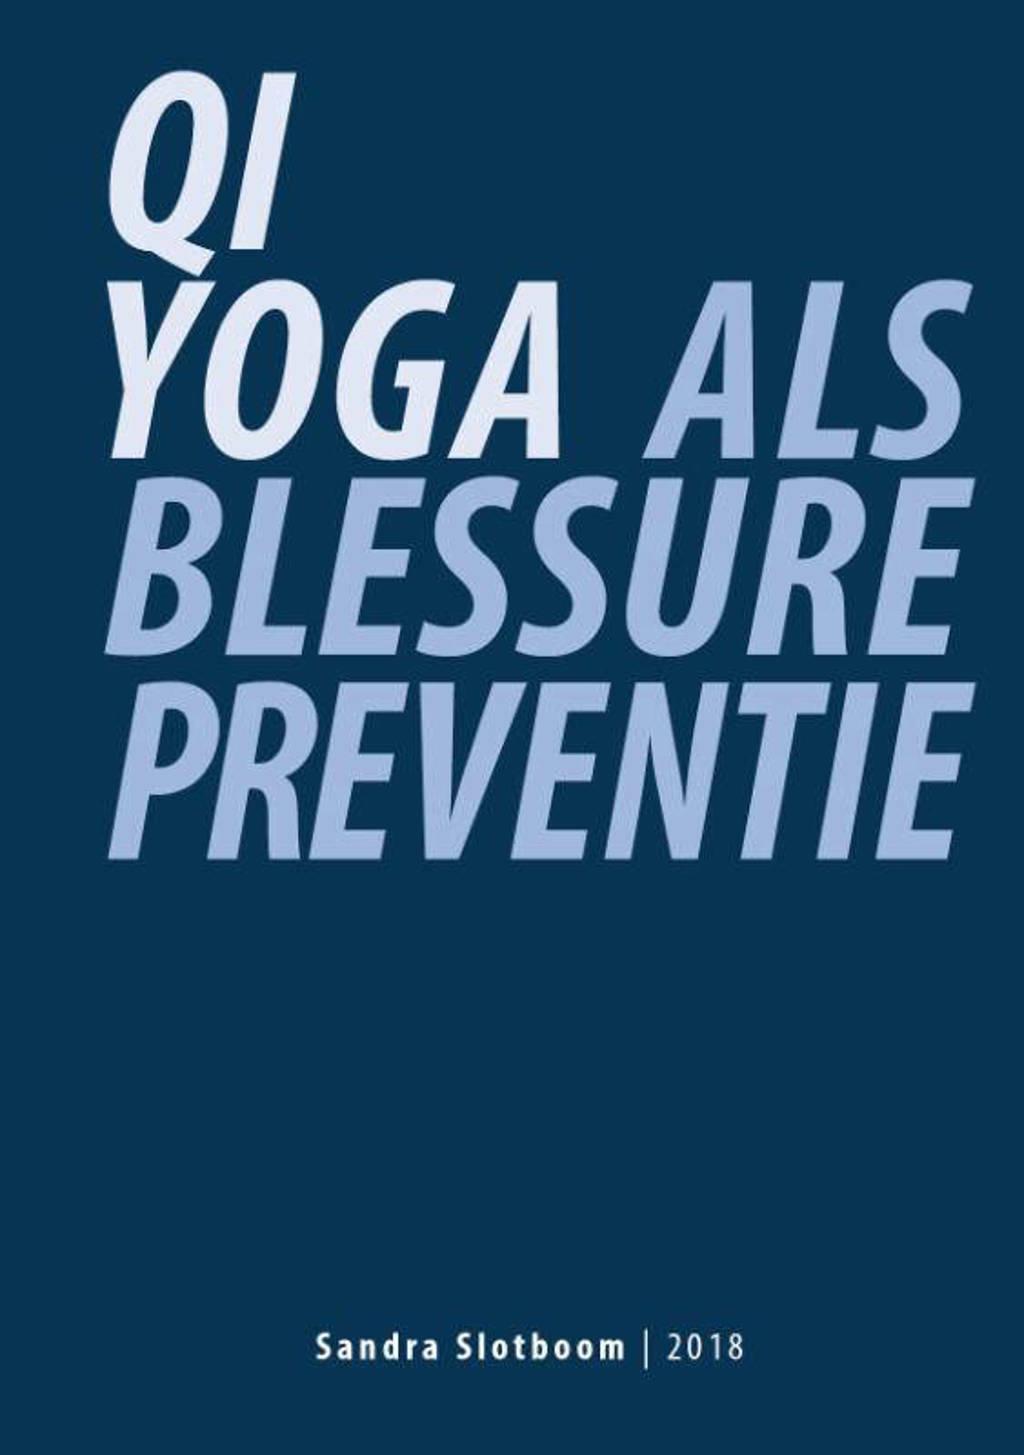 Qi Yoga als blessurepreventie - Sandra Slotboom